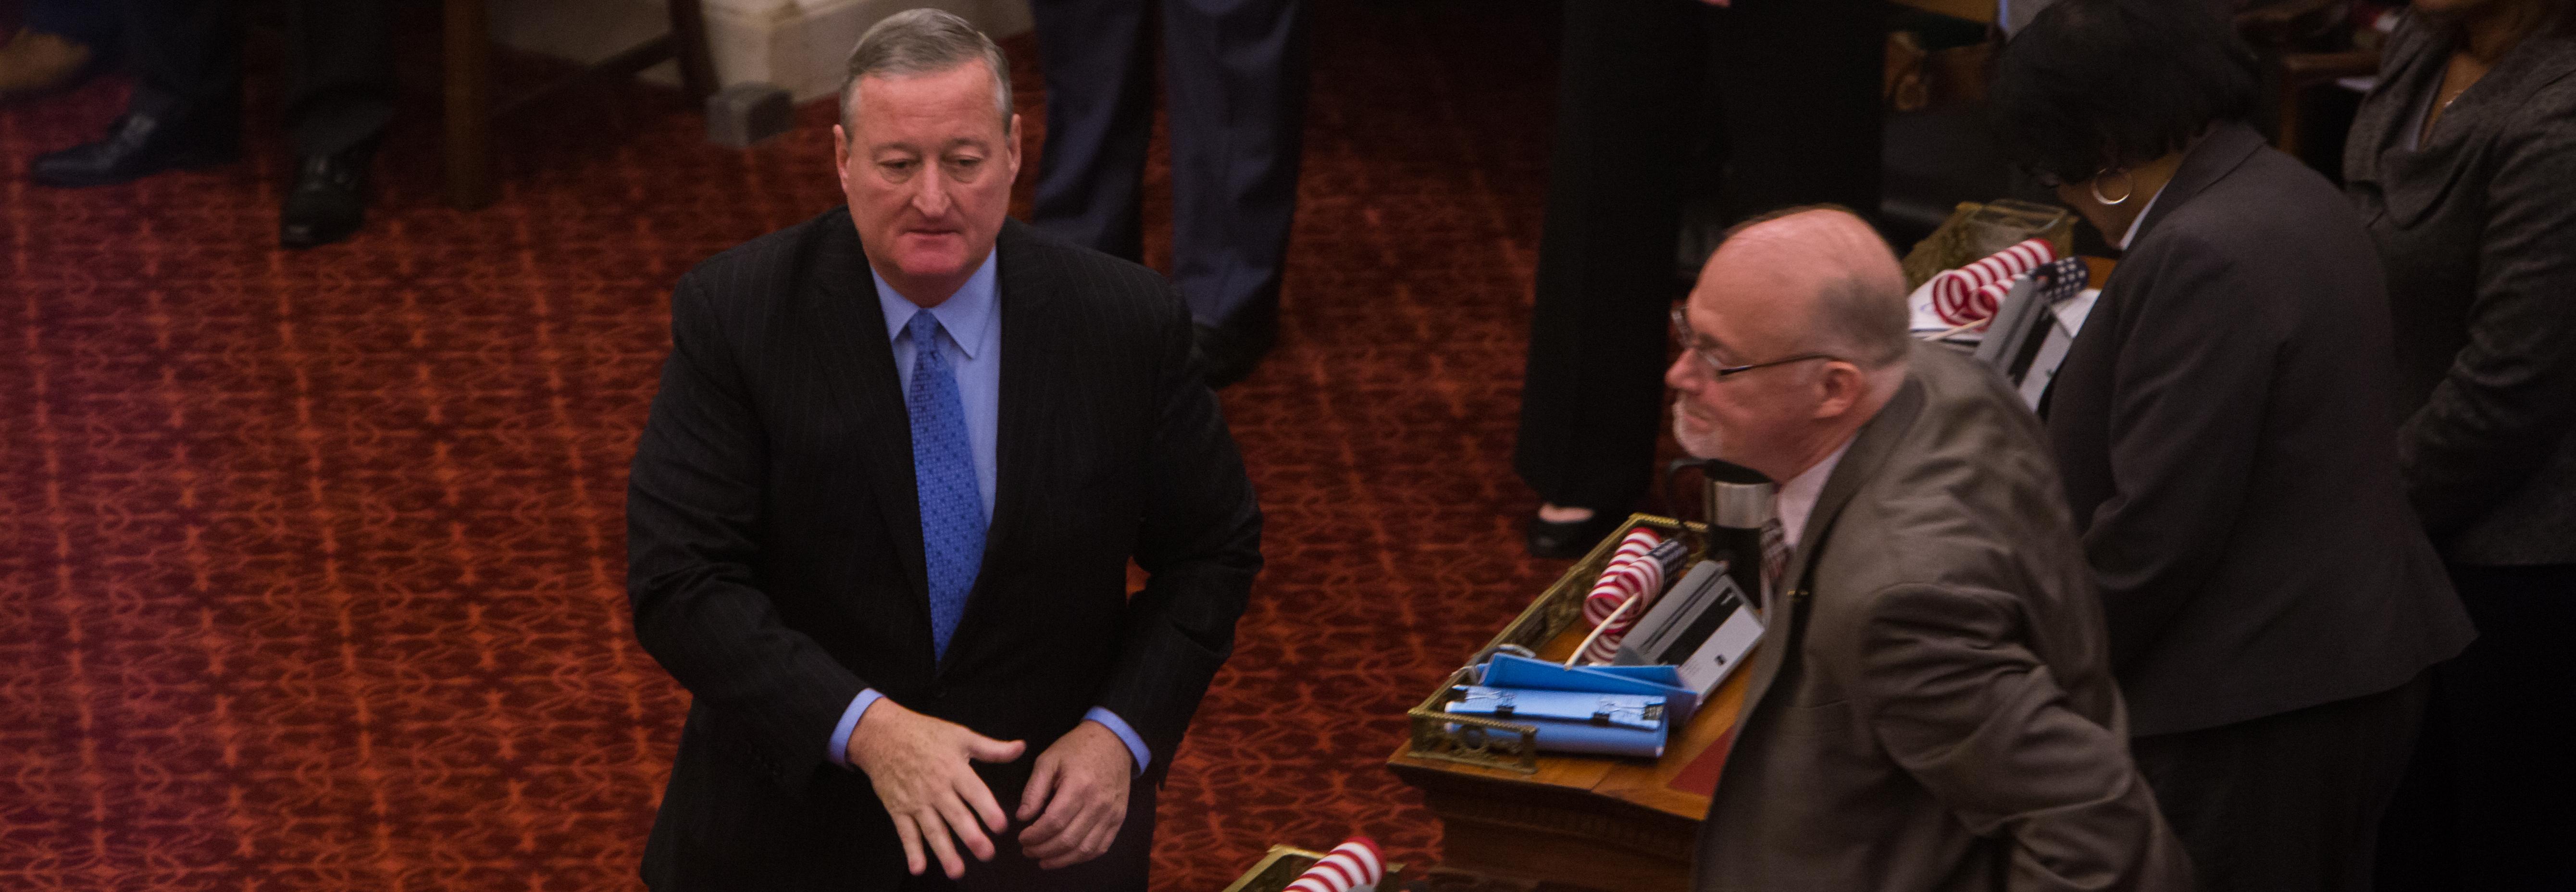 Jim Kenney, alcalde de Filadelfia. Foto: Samantha Laub / AL DÍA News